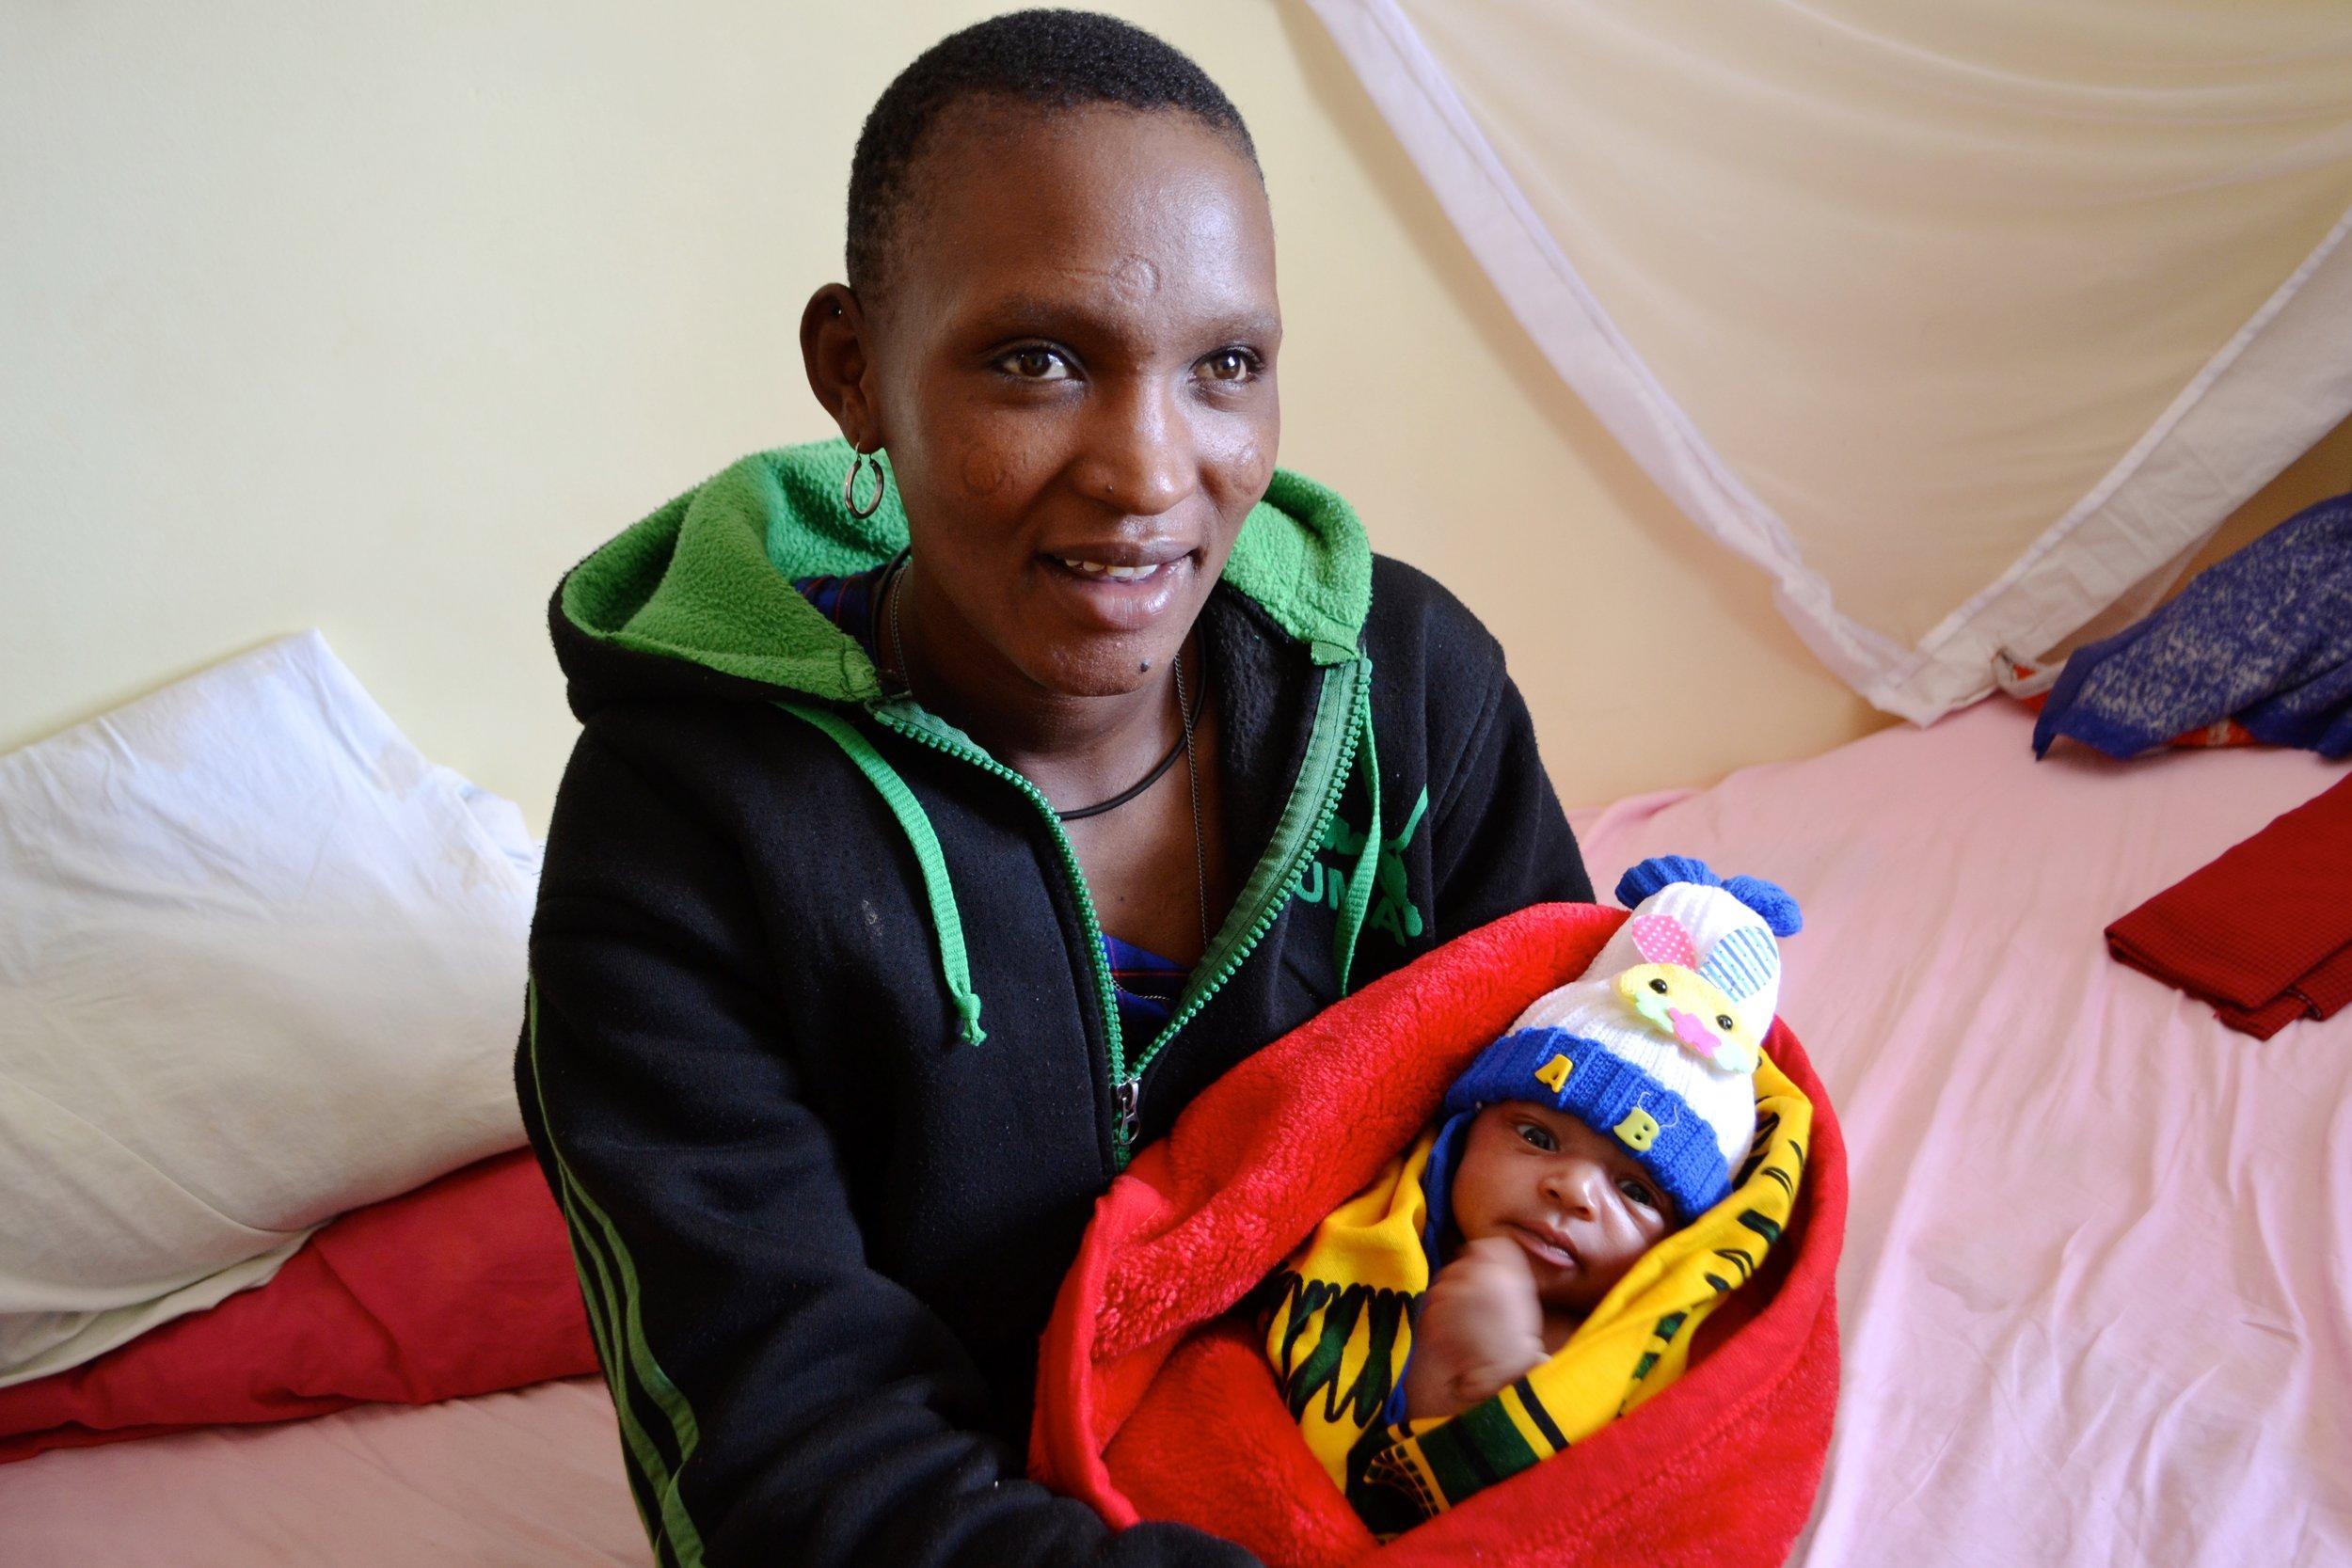 Namunyaki and her son, Julius, on discharge day